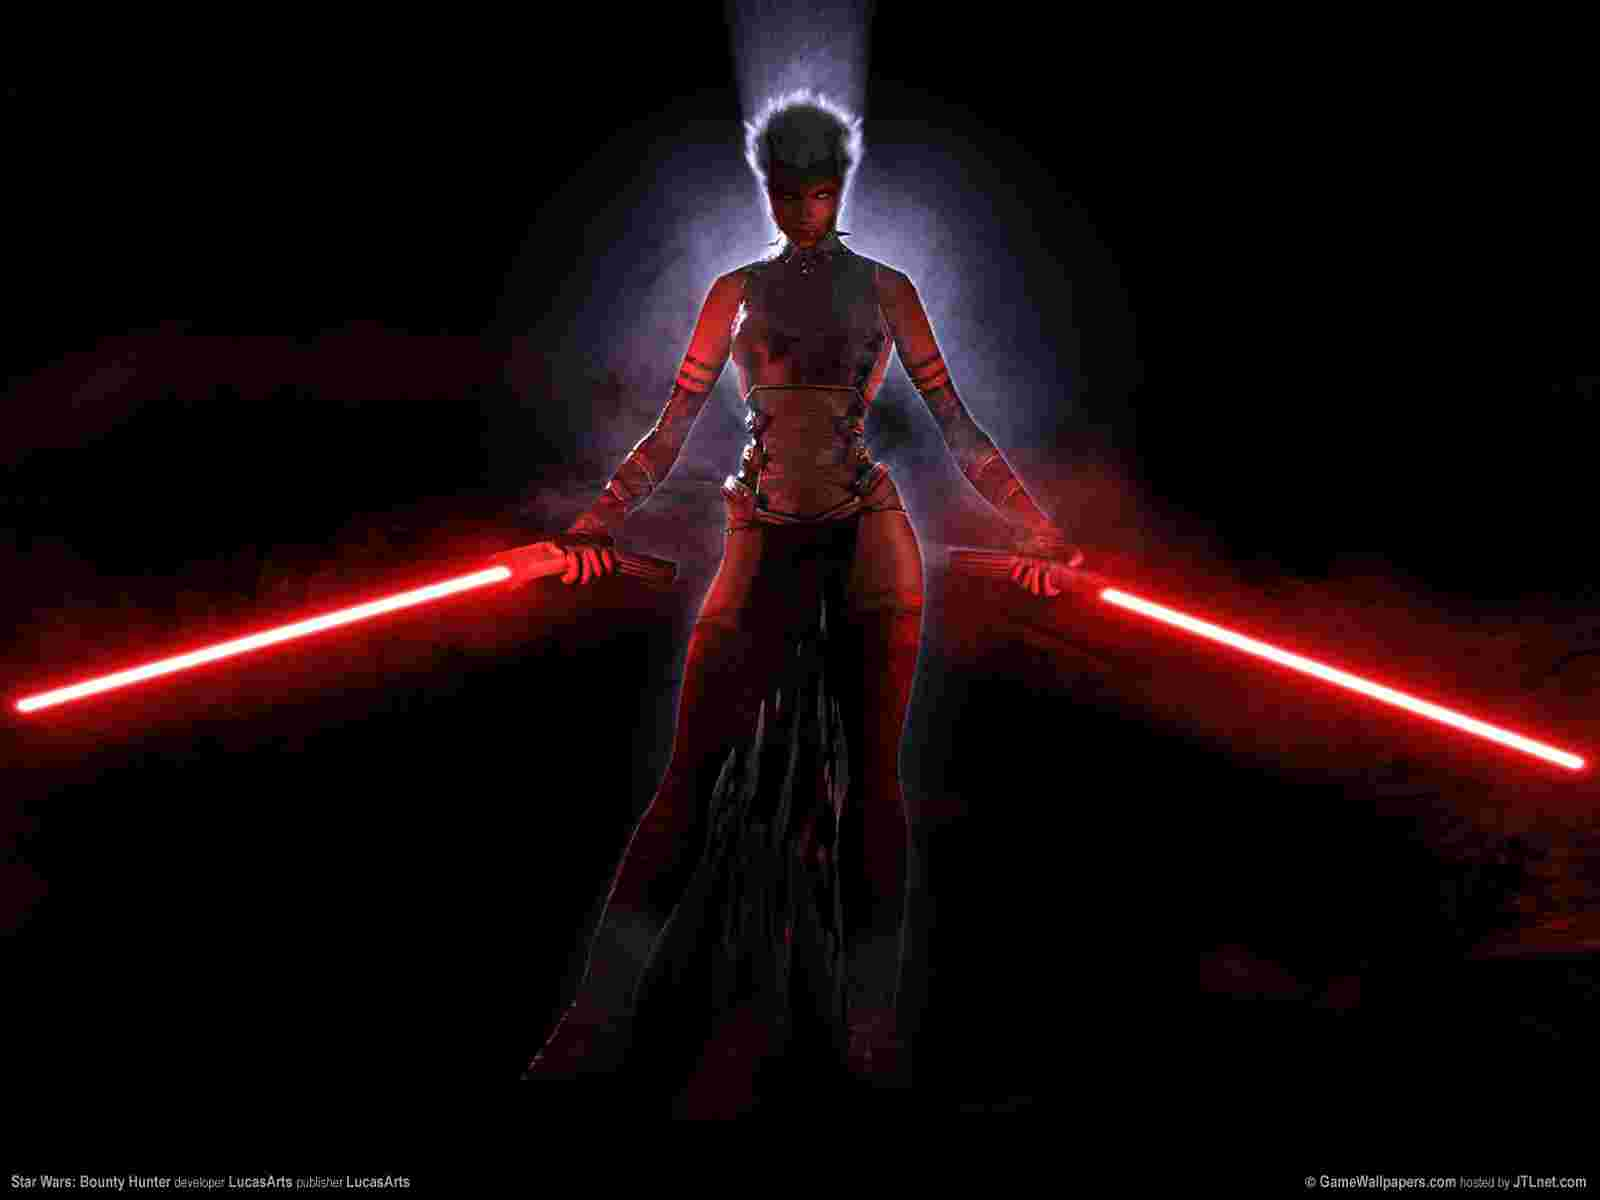 star wars bounty hunter 03 1600031 wallpaper   Star Wars   Games 1600x1200